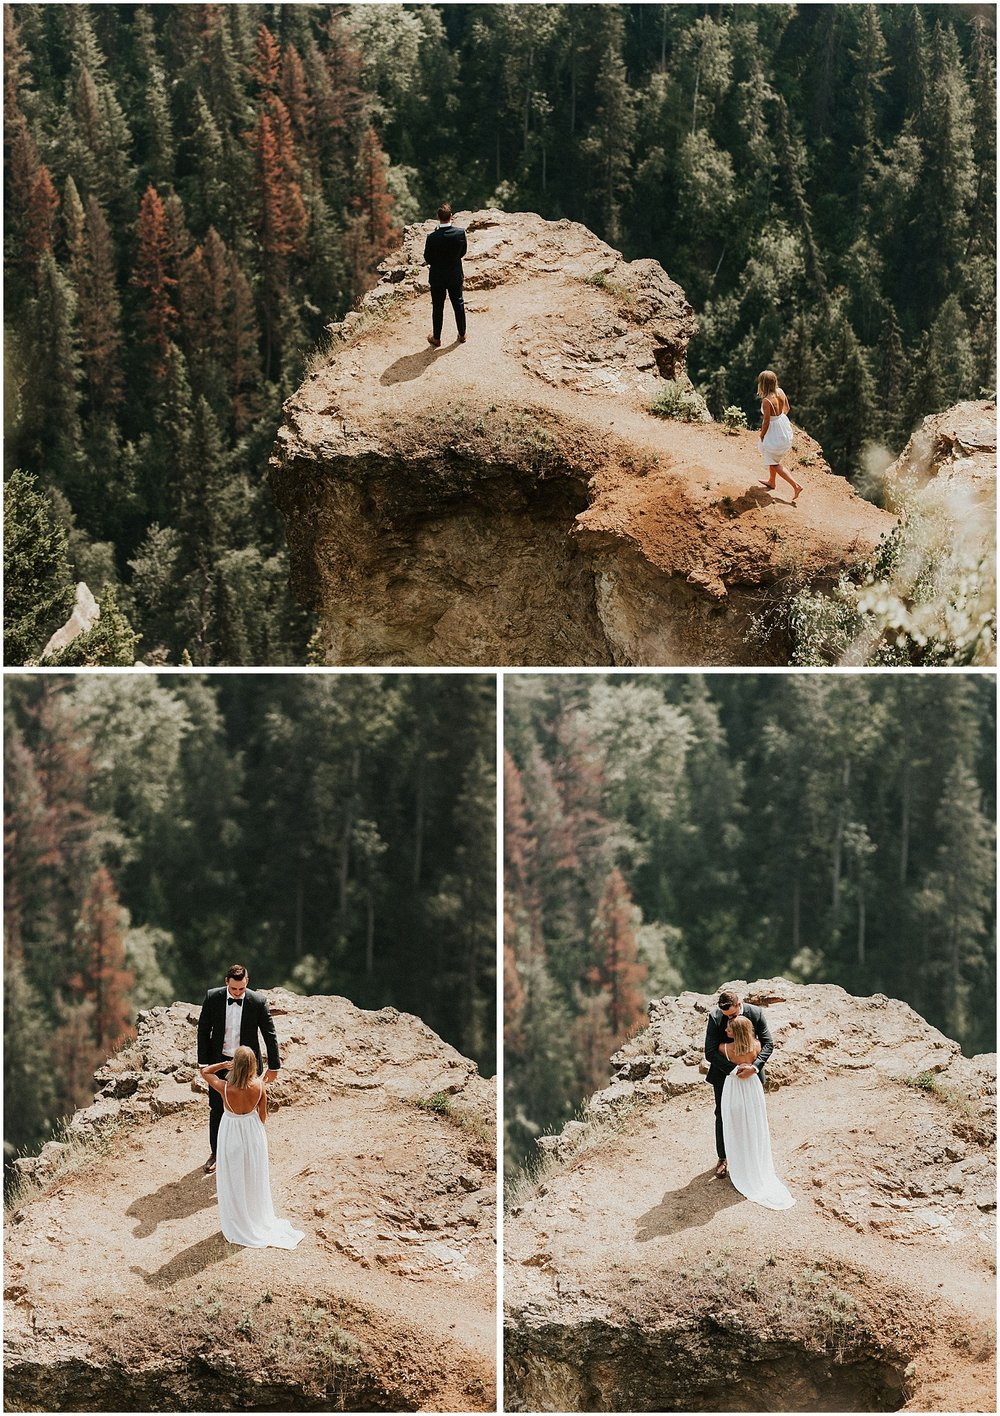 Quesnel_wedding_vancouver_bc_elopement_Pinnacles_Provincial_Park_0194.jpg